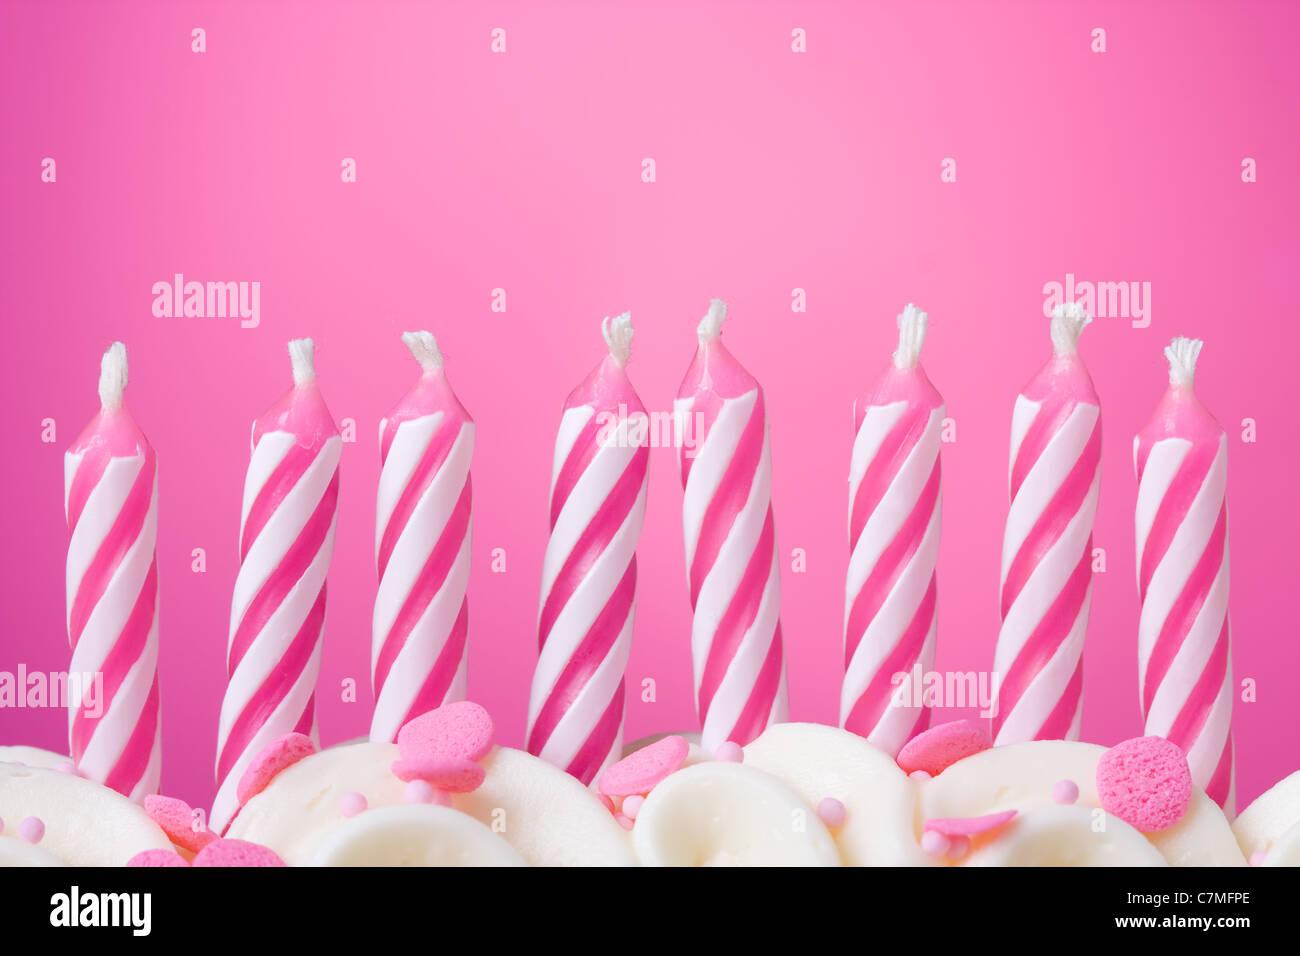 Unlit birthday candles - Stock Image